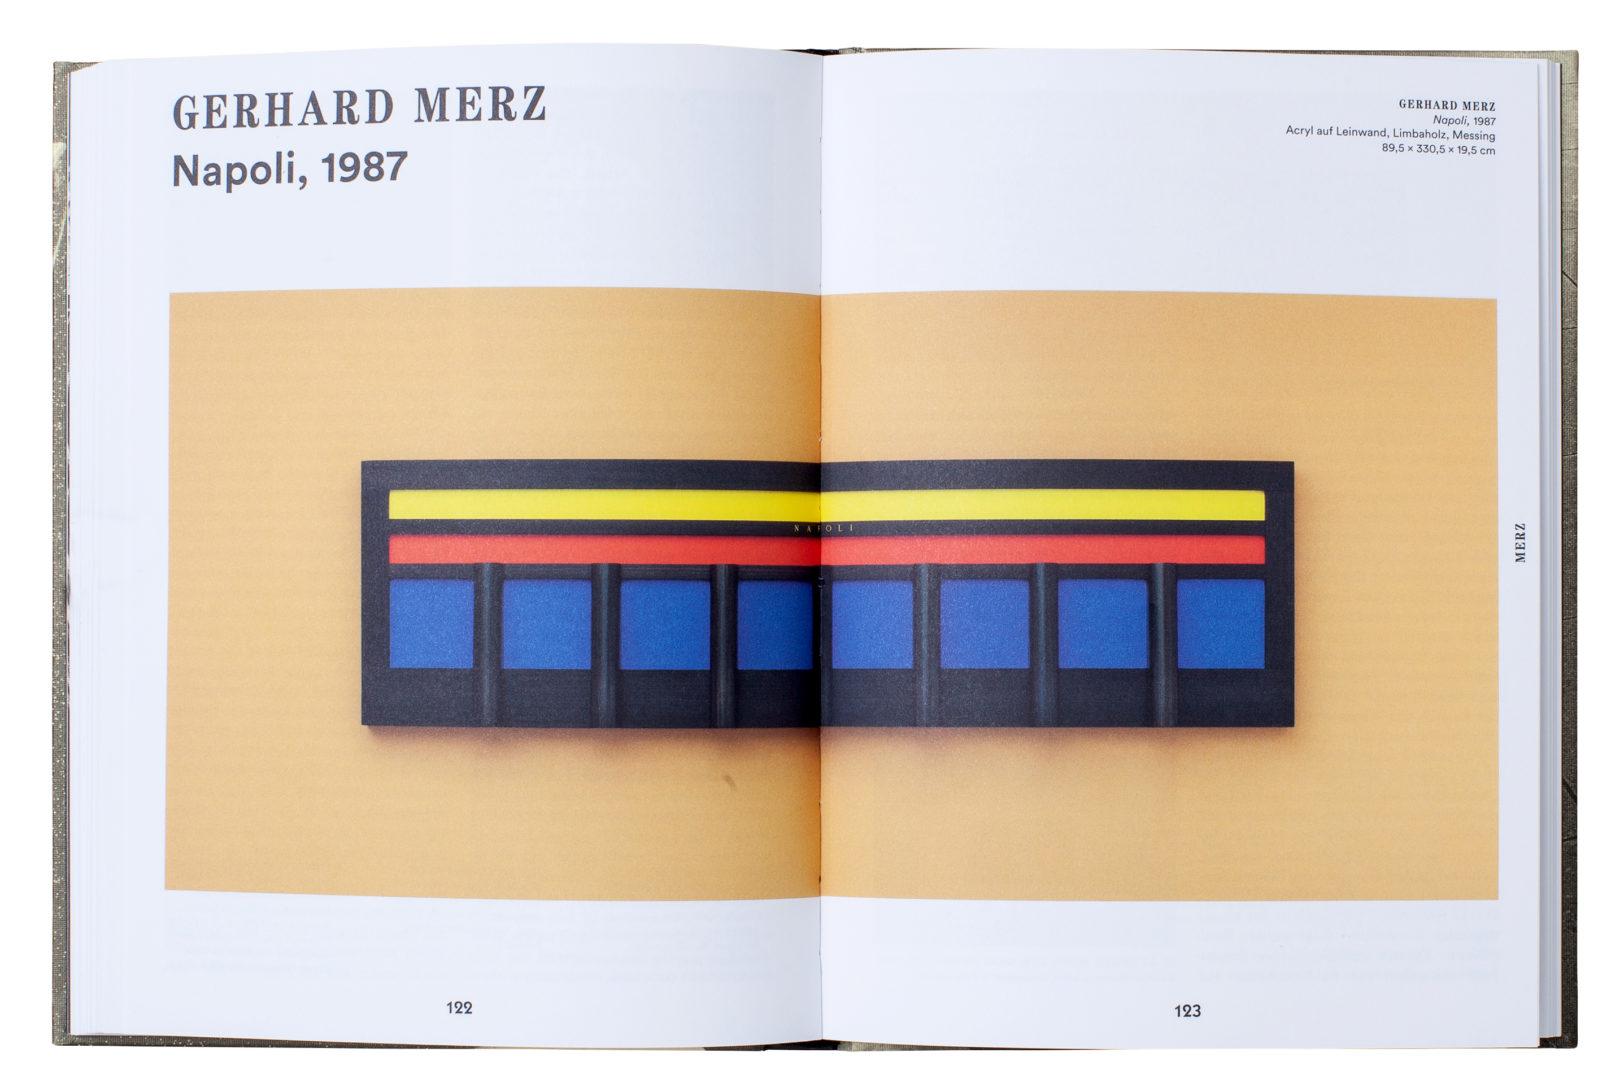 http://e-o-t.de/wordpress/wp-content/uploads/2020/06/Books-Marx-eot19.jpg